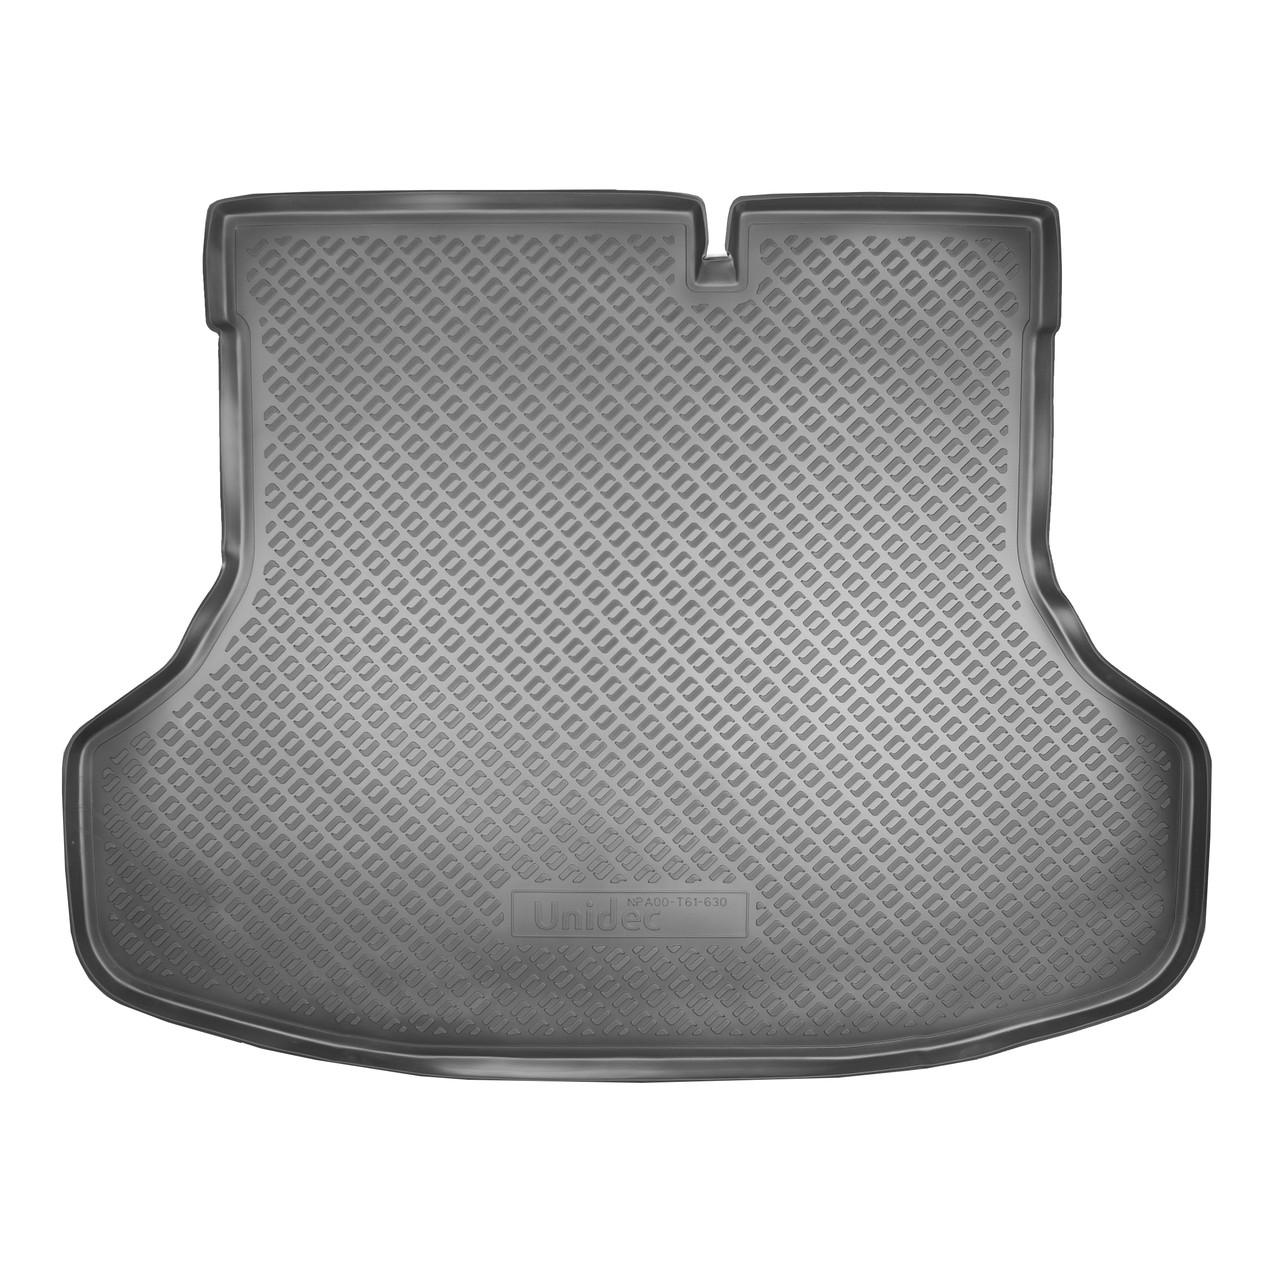 Коврик в багажник Nissan Sentra (B17) SD (2014)